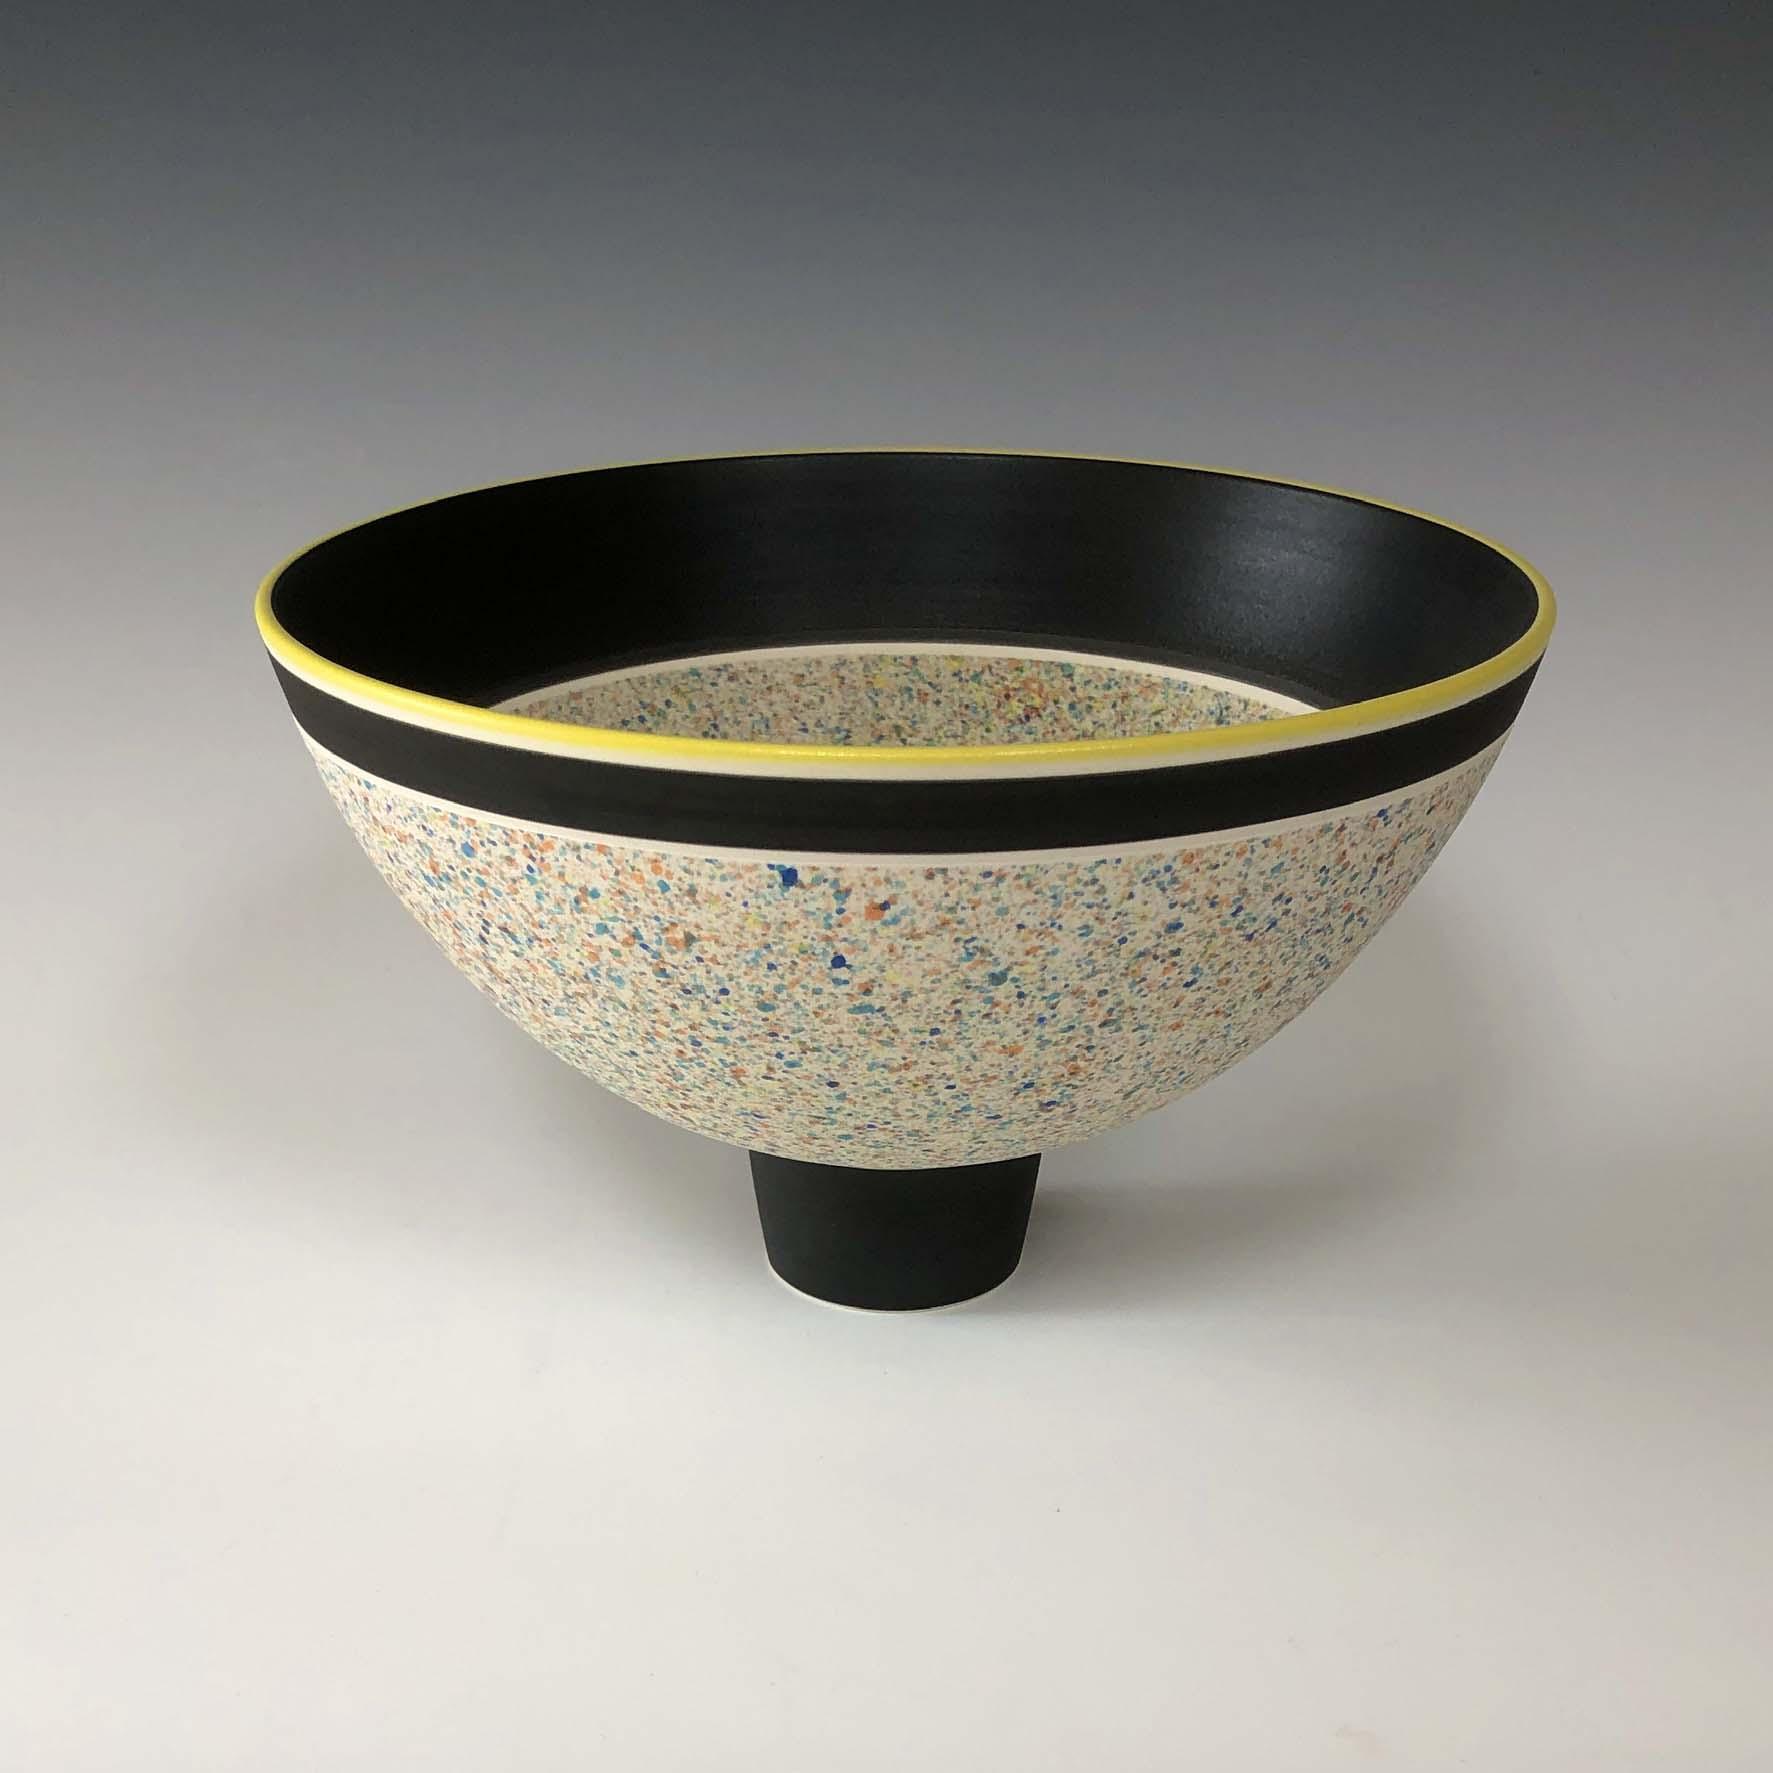 Pot 1. Black:Yellow flecked bowl on foot